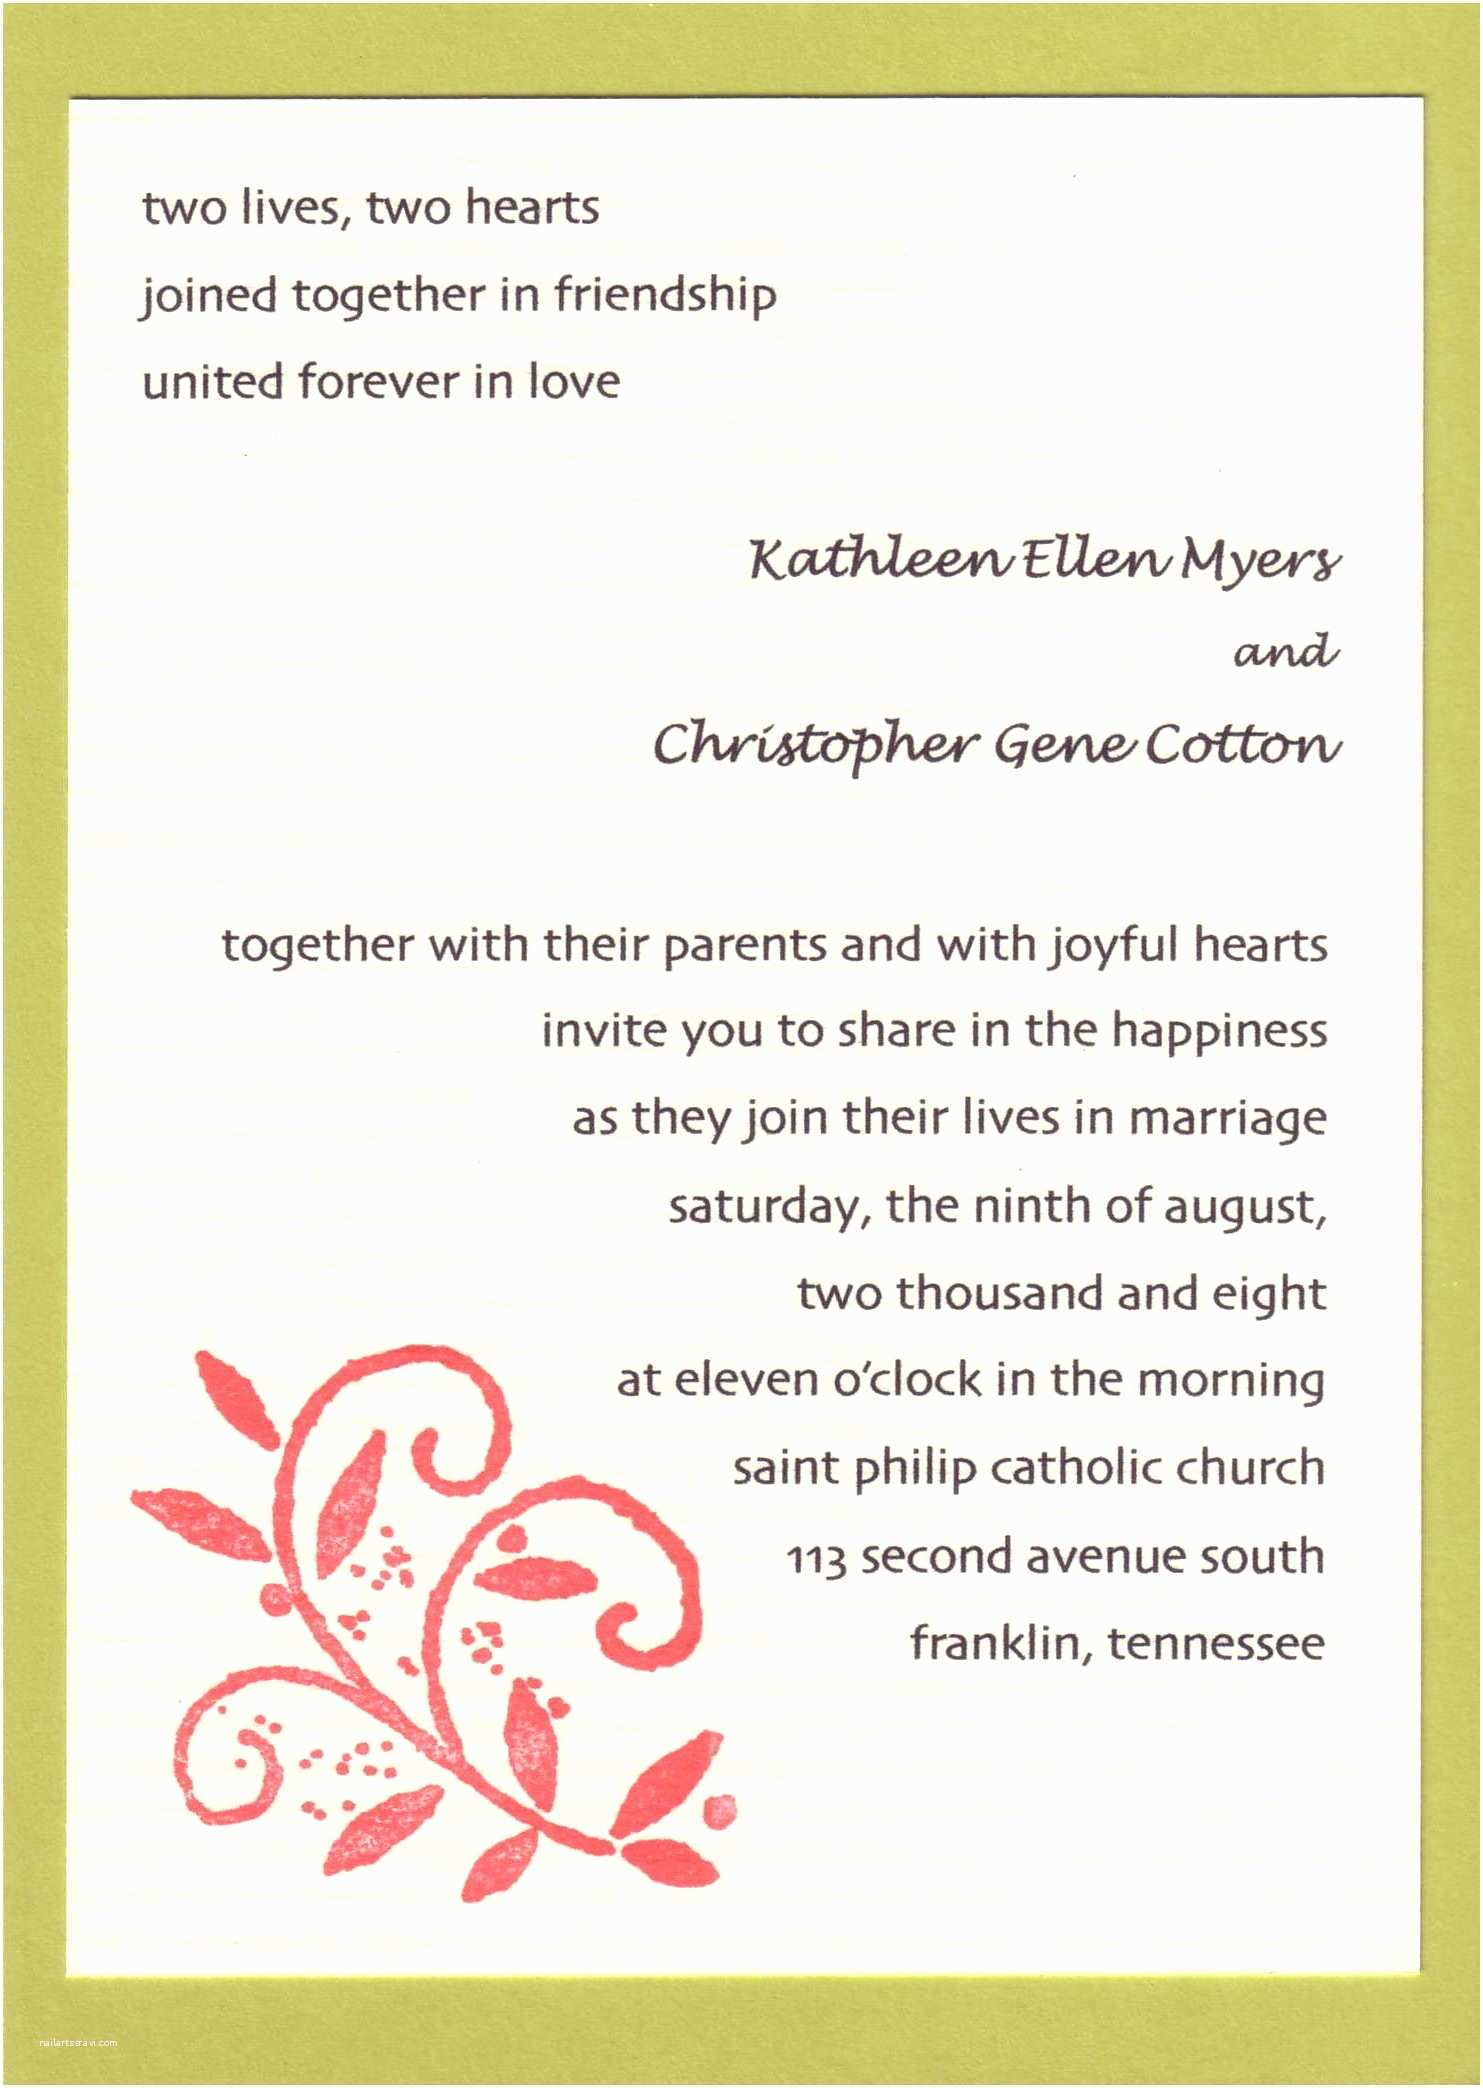 Romantic Wedding Invitations Wording Examples Romantic Dinner Invitation Wording Various Invitation